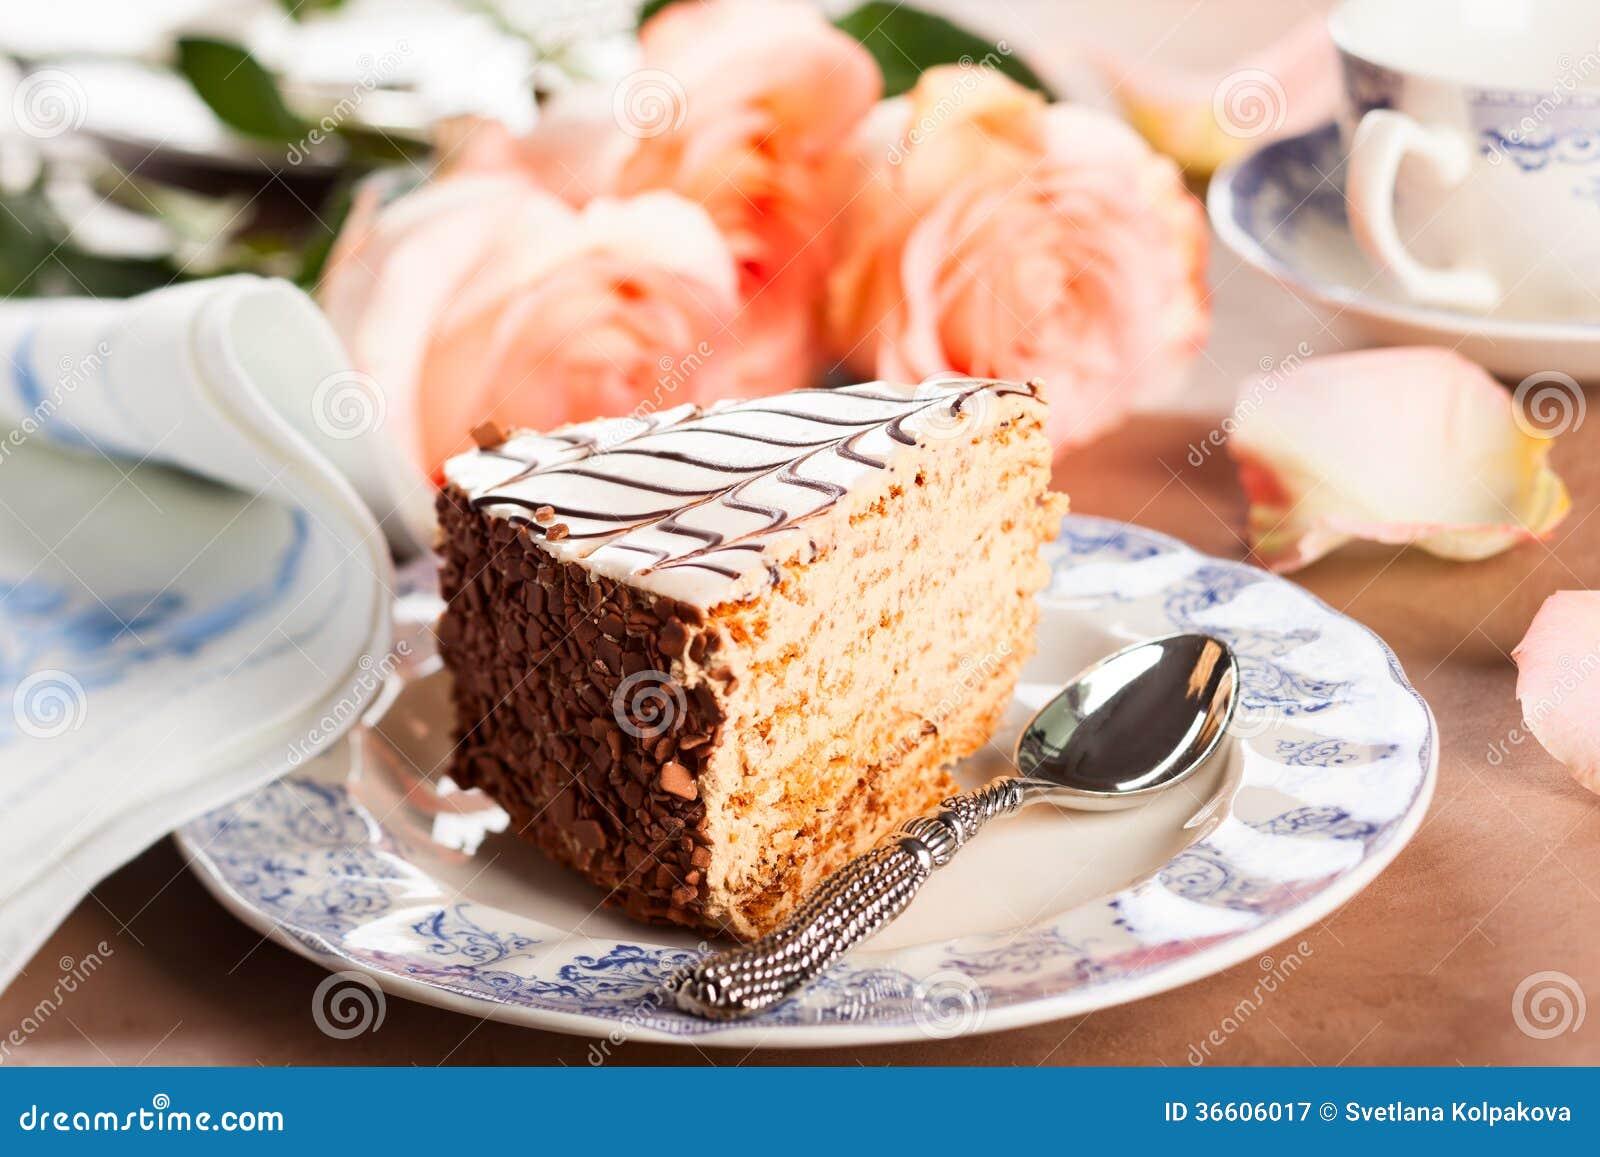 Chocolate Almond Meringue Torte